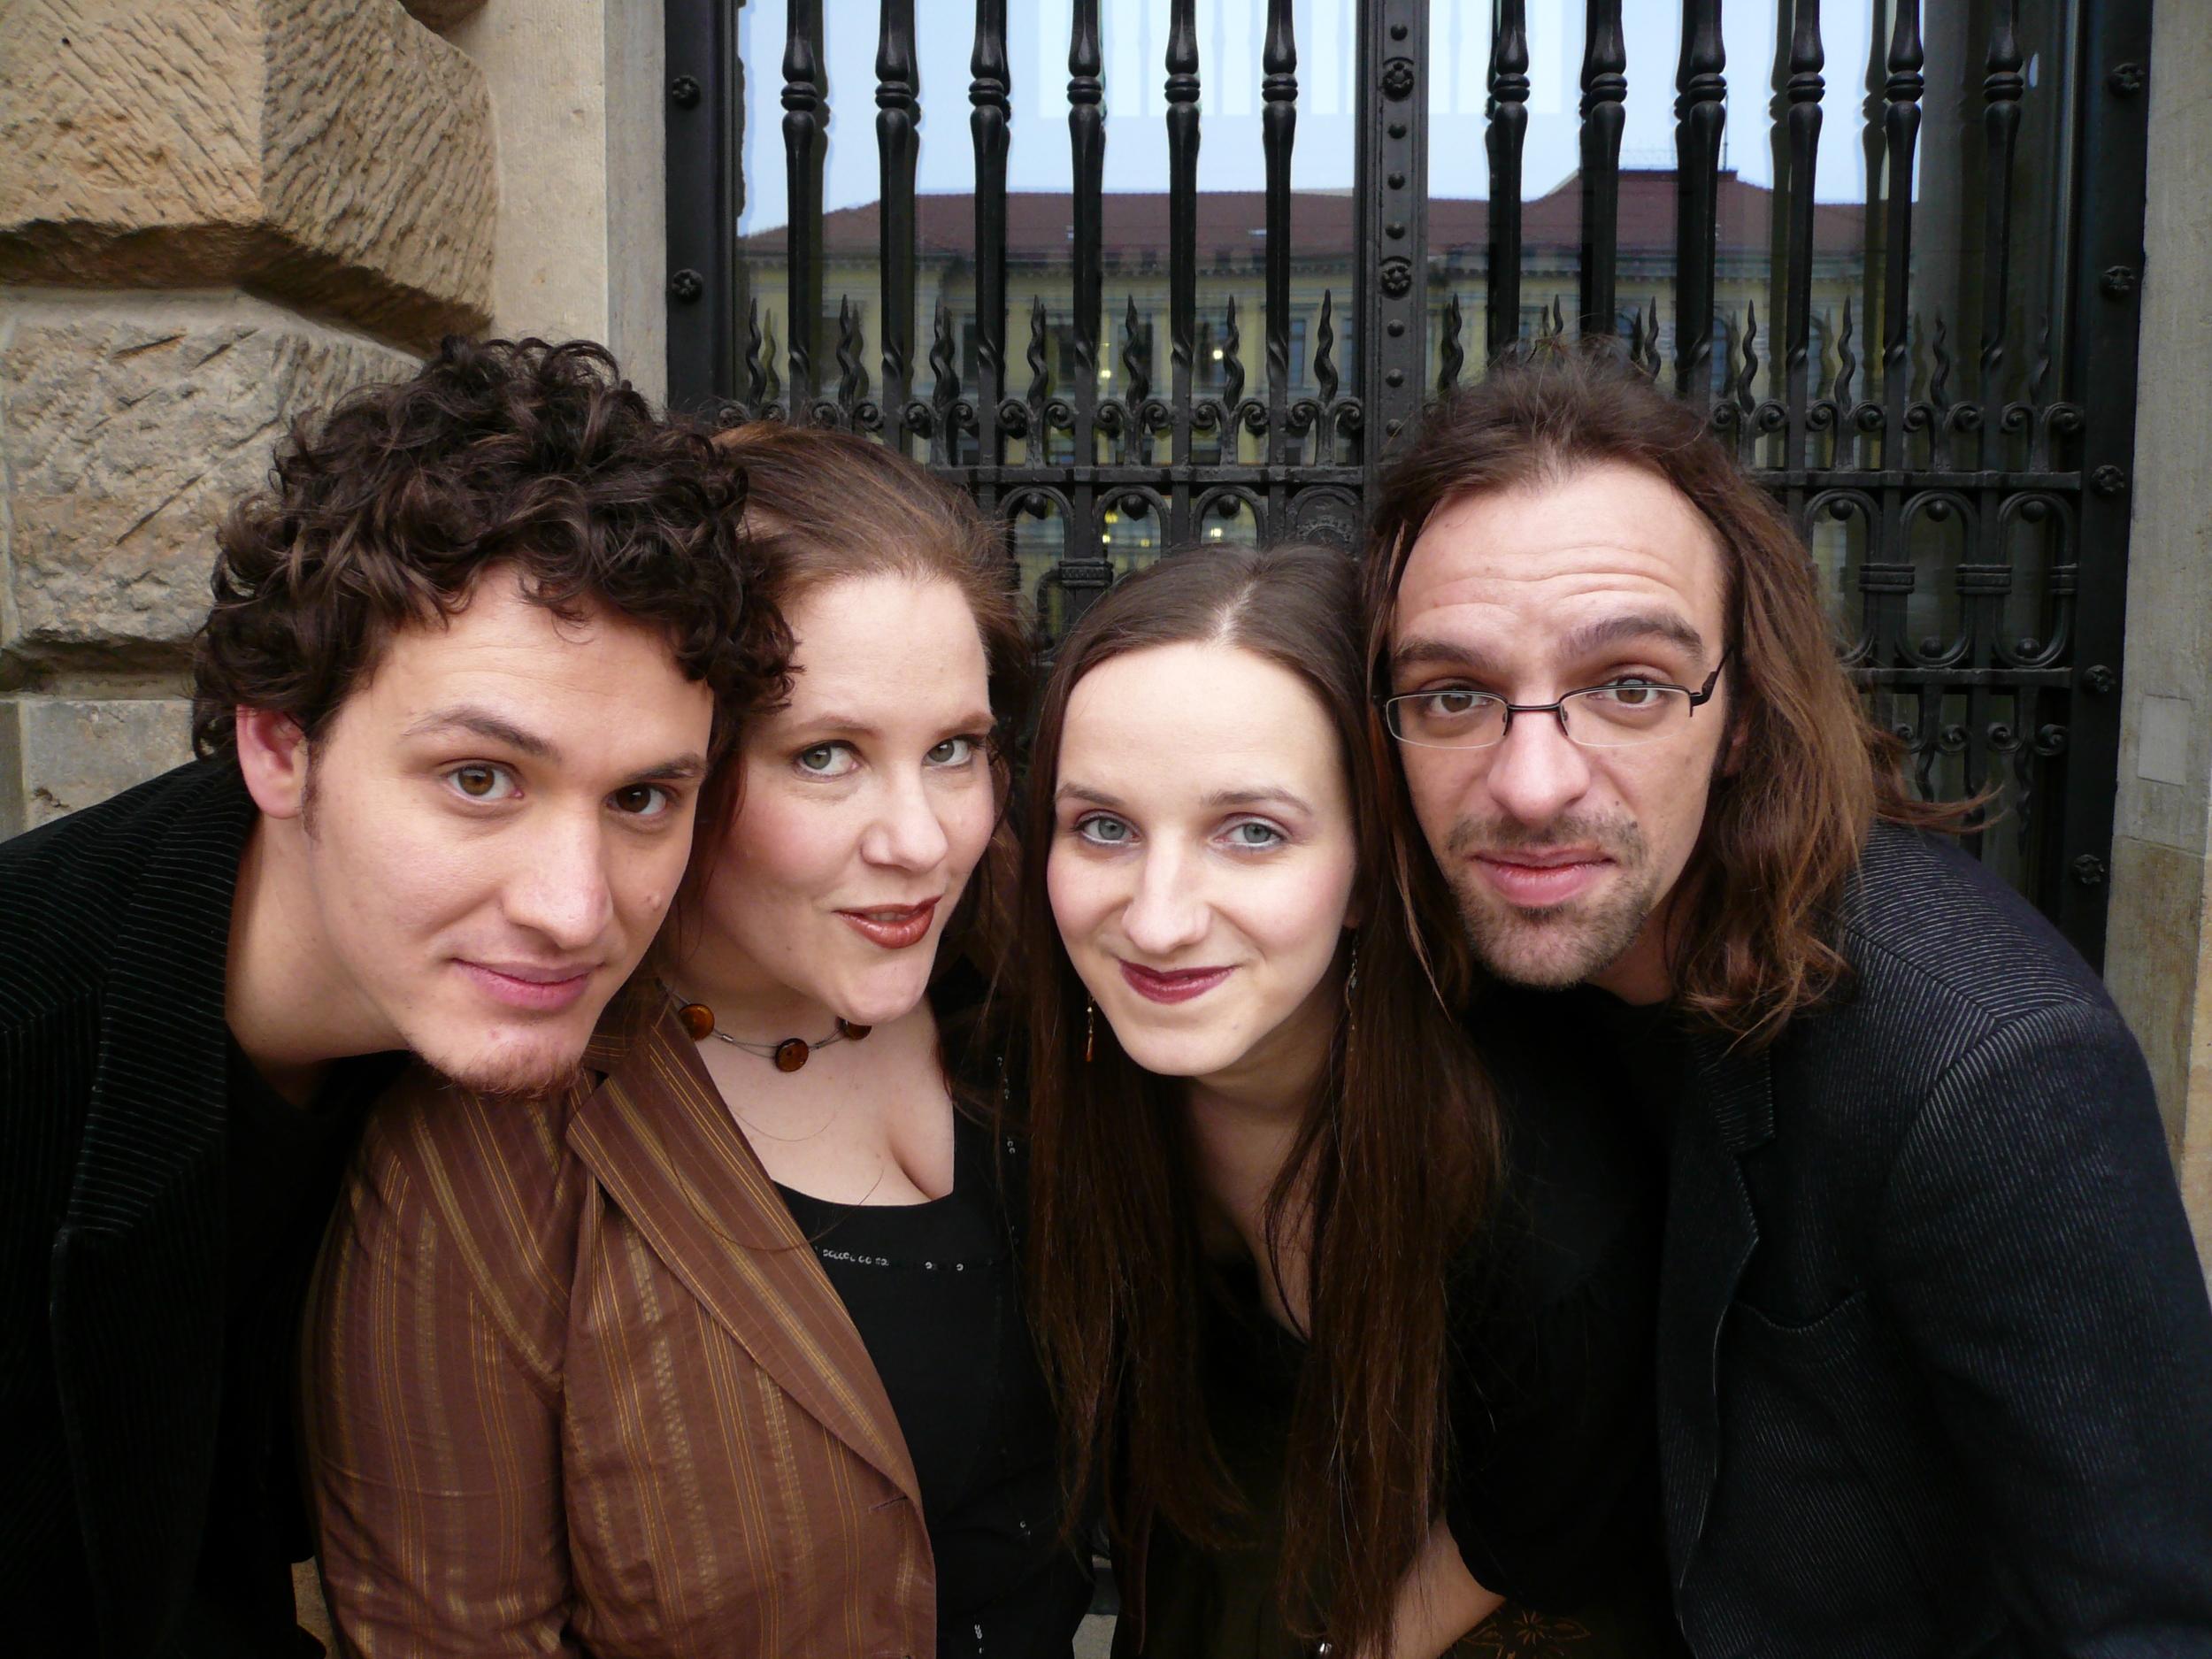 Klangbezirk (Juan Garcia, B.B., Tanja Pannier und Matthias Knoche), Leipzig, Mai 2008